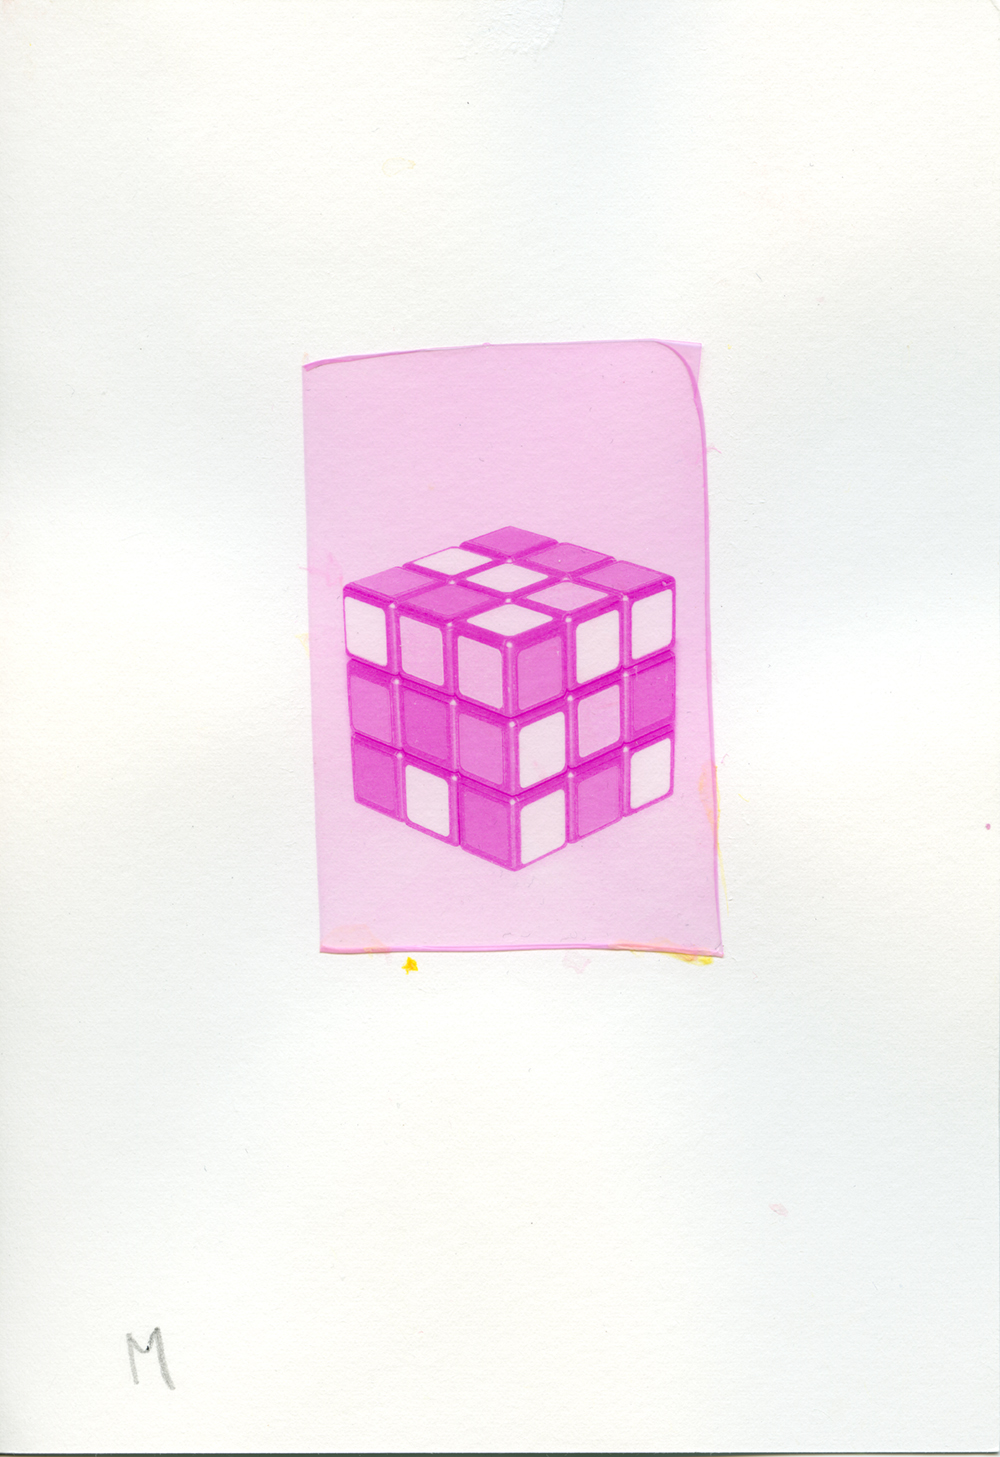 [C/M/Y_cube] ©Yuji Hamada, Courtesy of the artist and Photo Gallery International